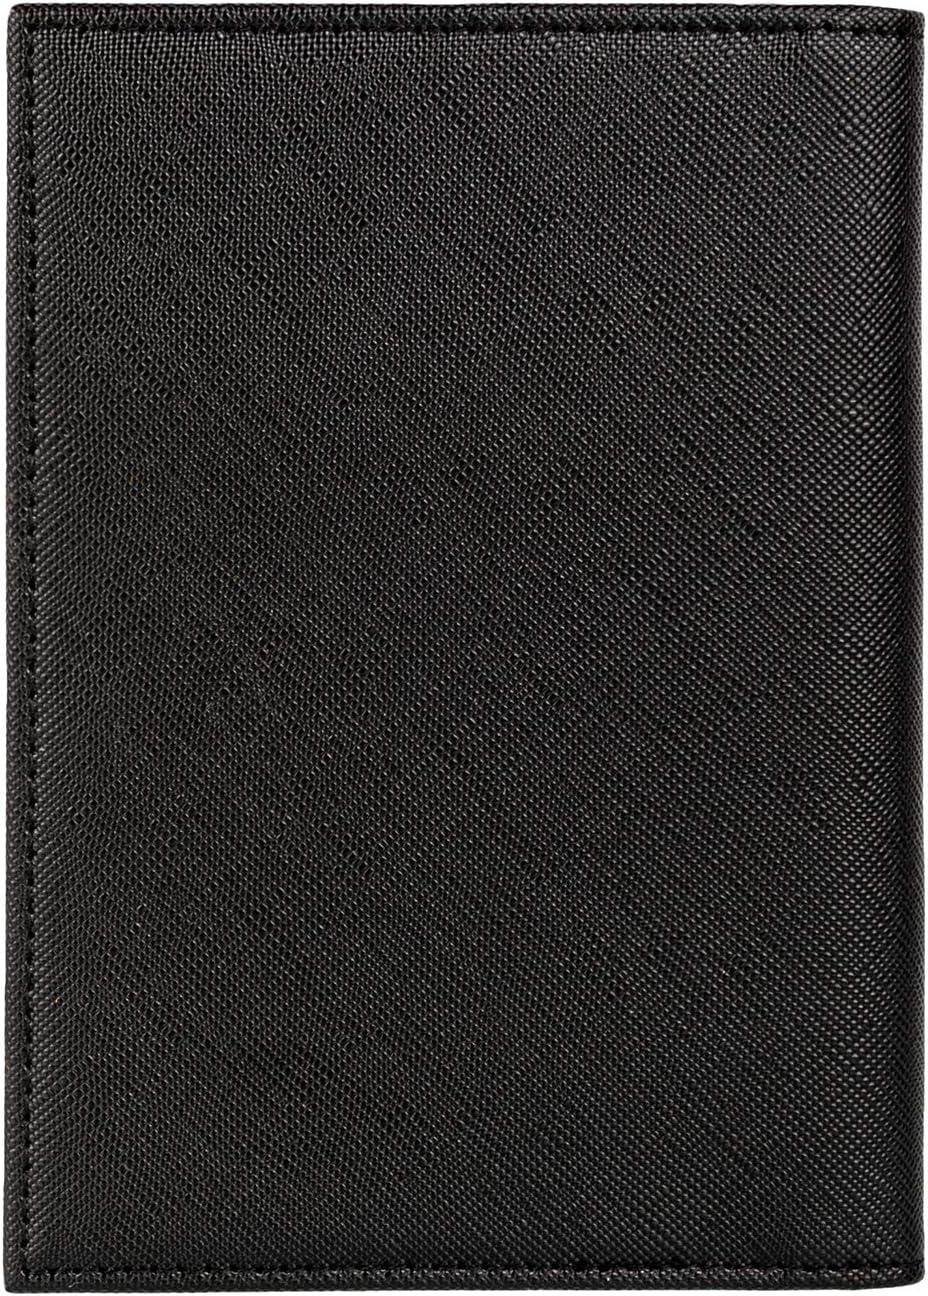 Passport Holder Cover Wallet RFID Blocking Leather Card Case Travel Accessories for Women Men Cross pattern black